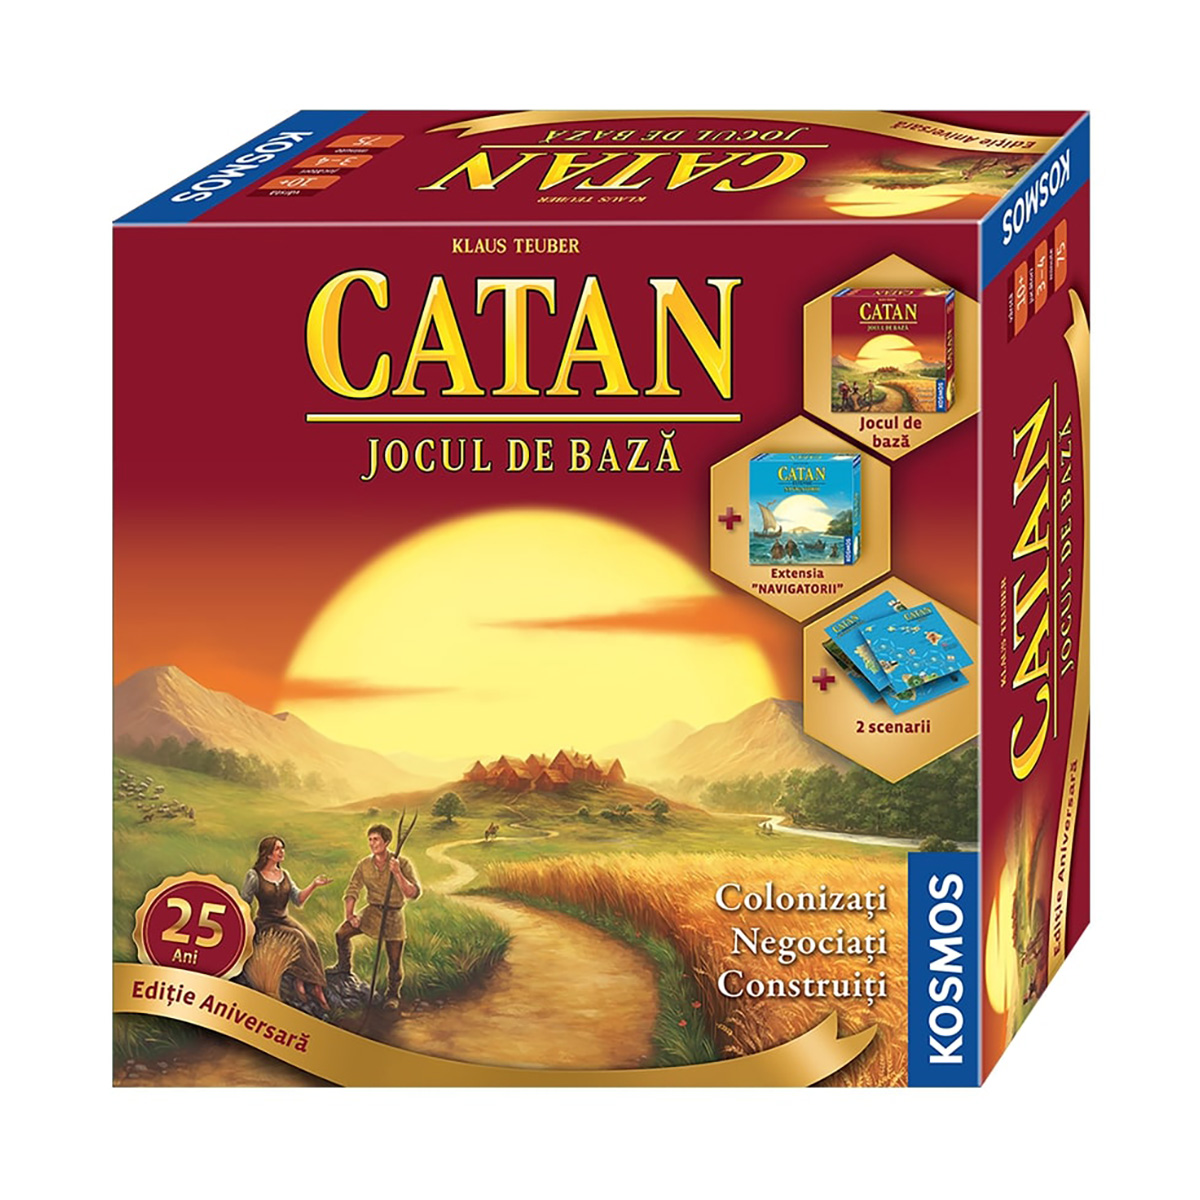 Joc Catan, Editie aniversara 25 de ani